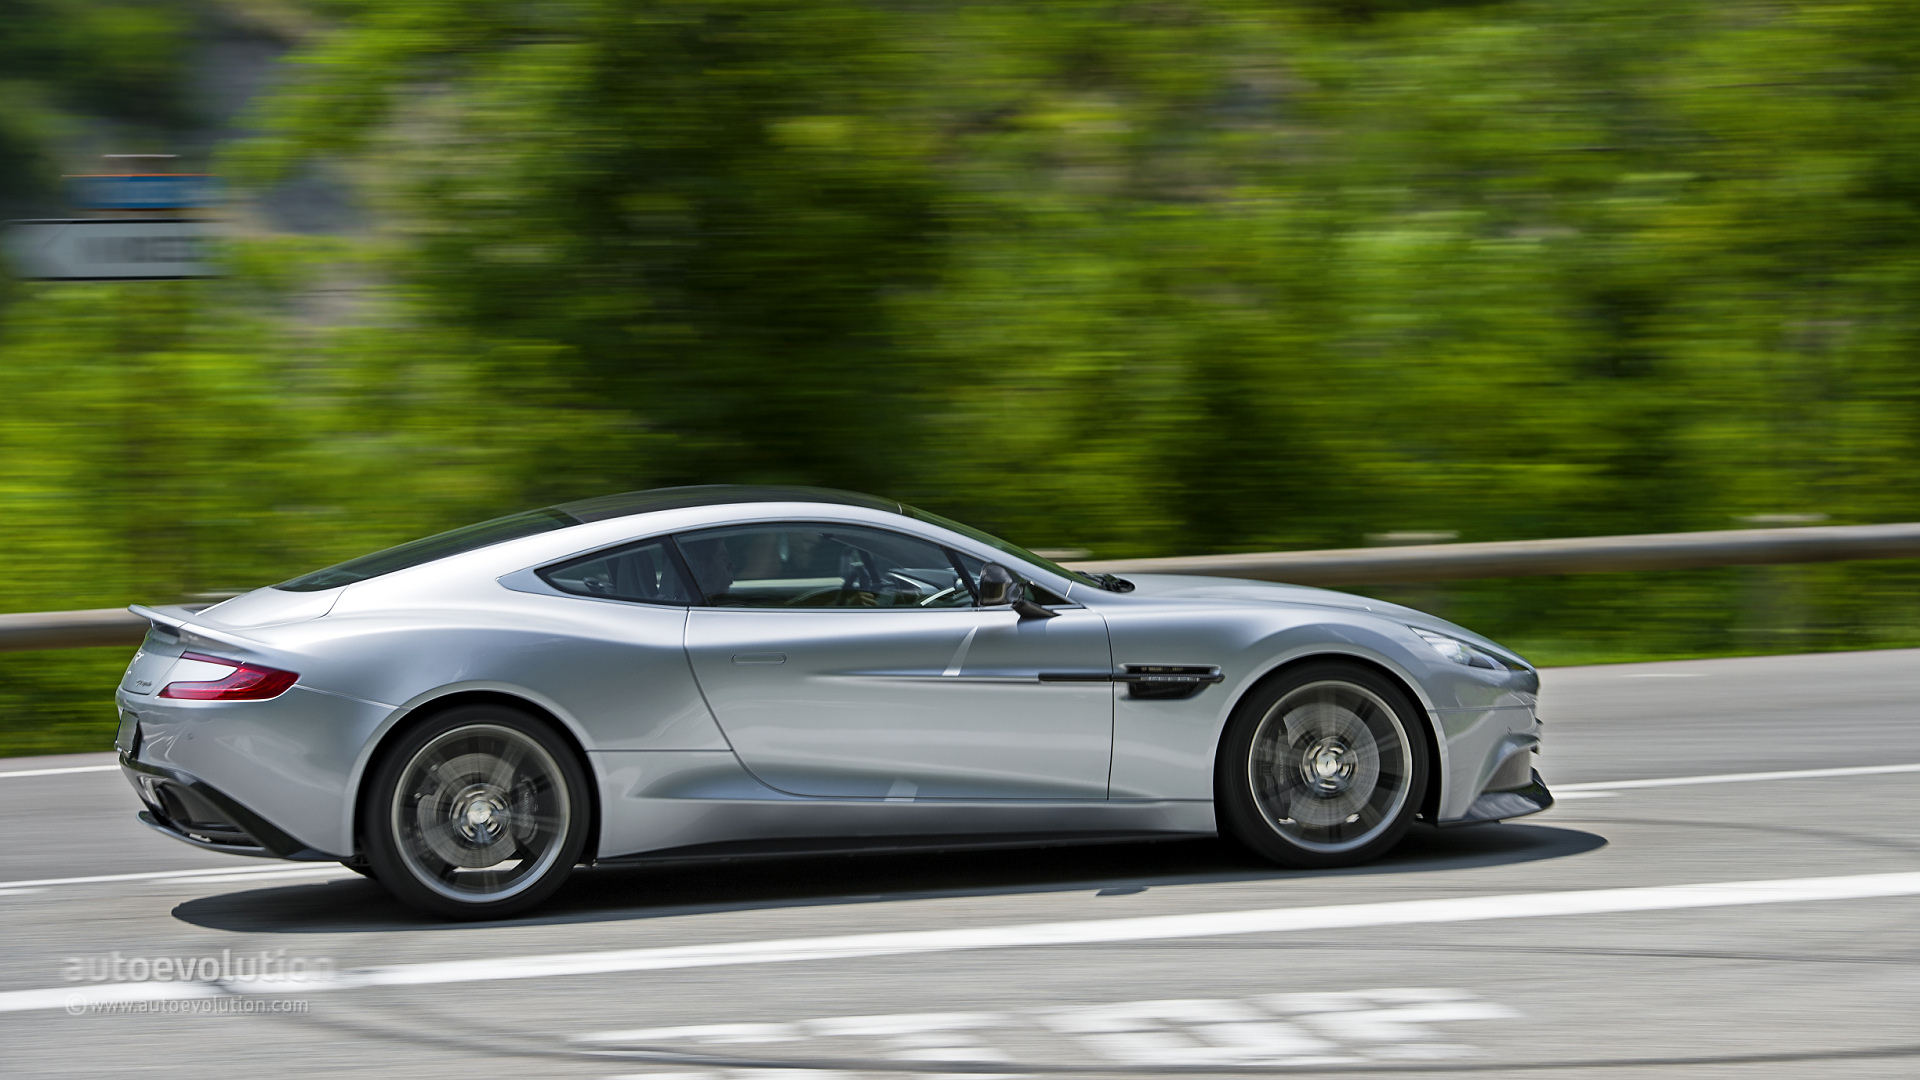 Aston Martin  Vanquish  Overview